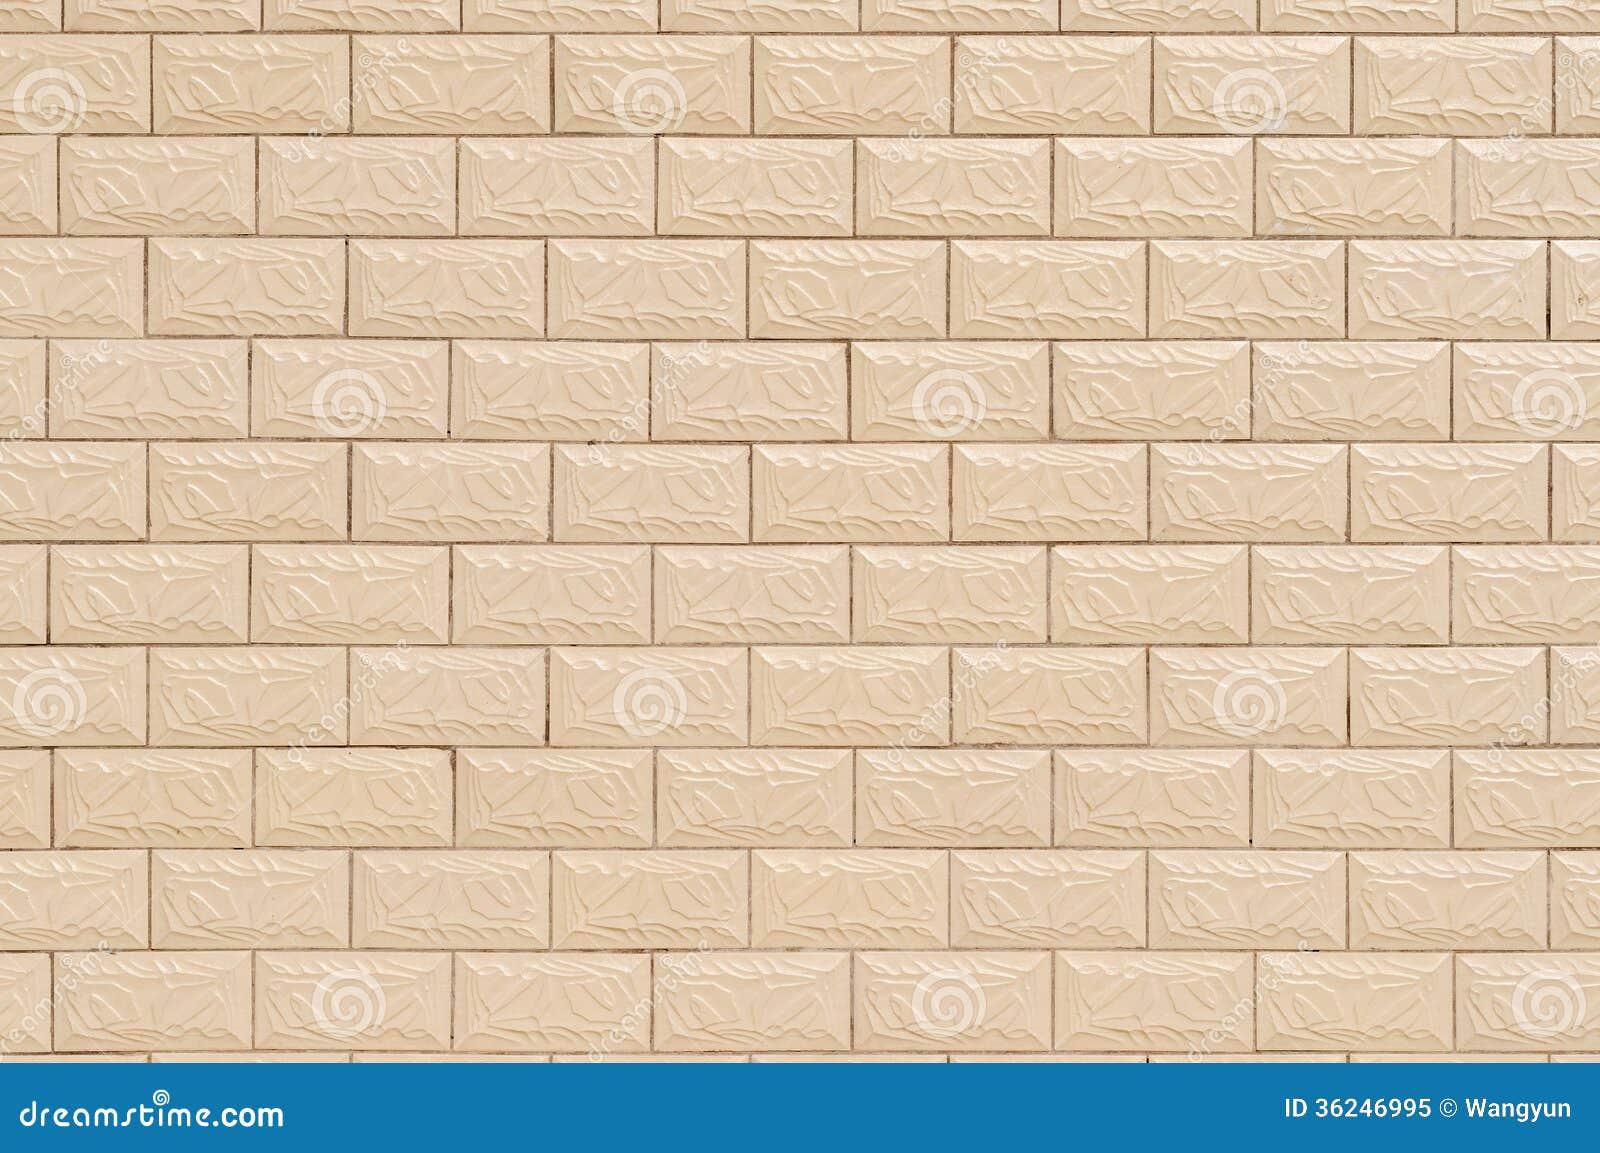 Tile Texture Royalty Free Stock Photo - Image: 36246995